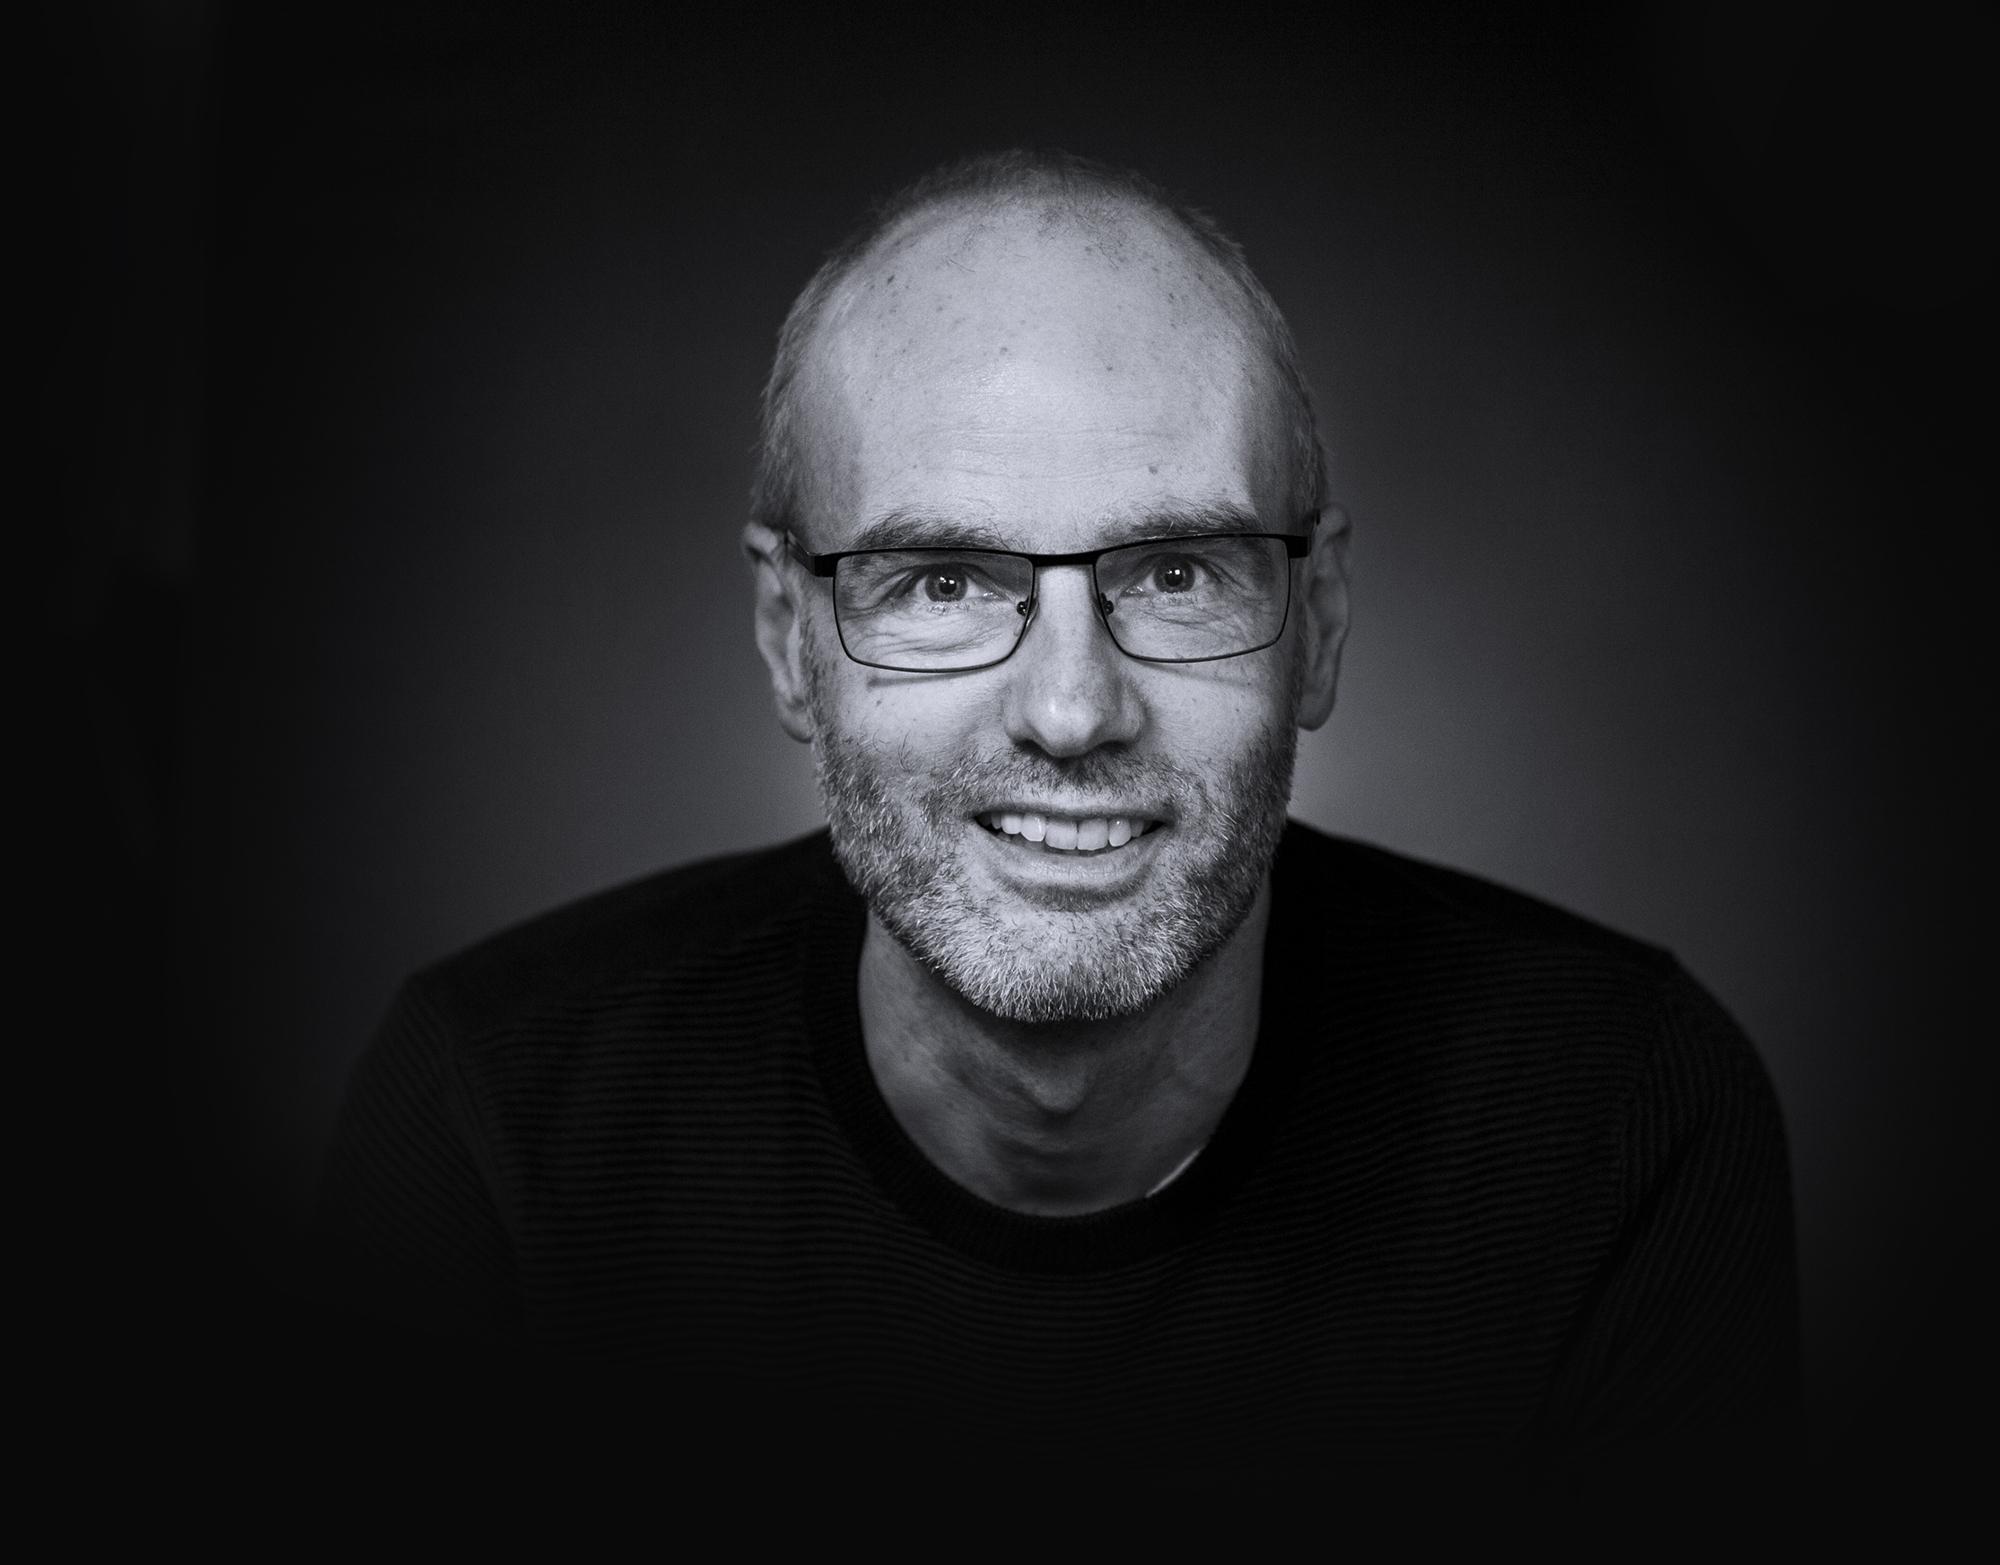 Jan-Willem Bosman